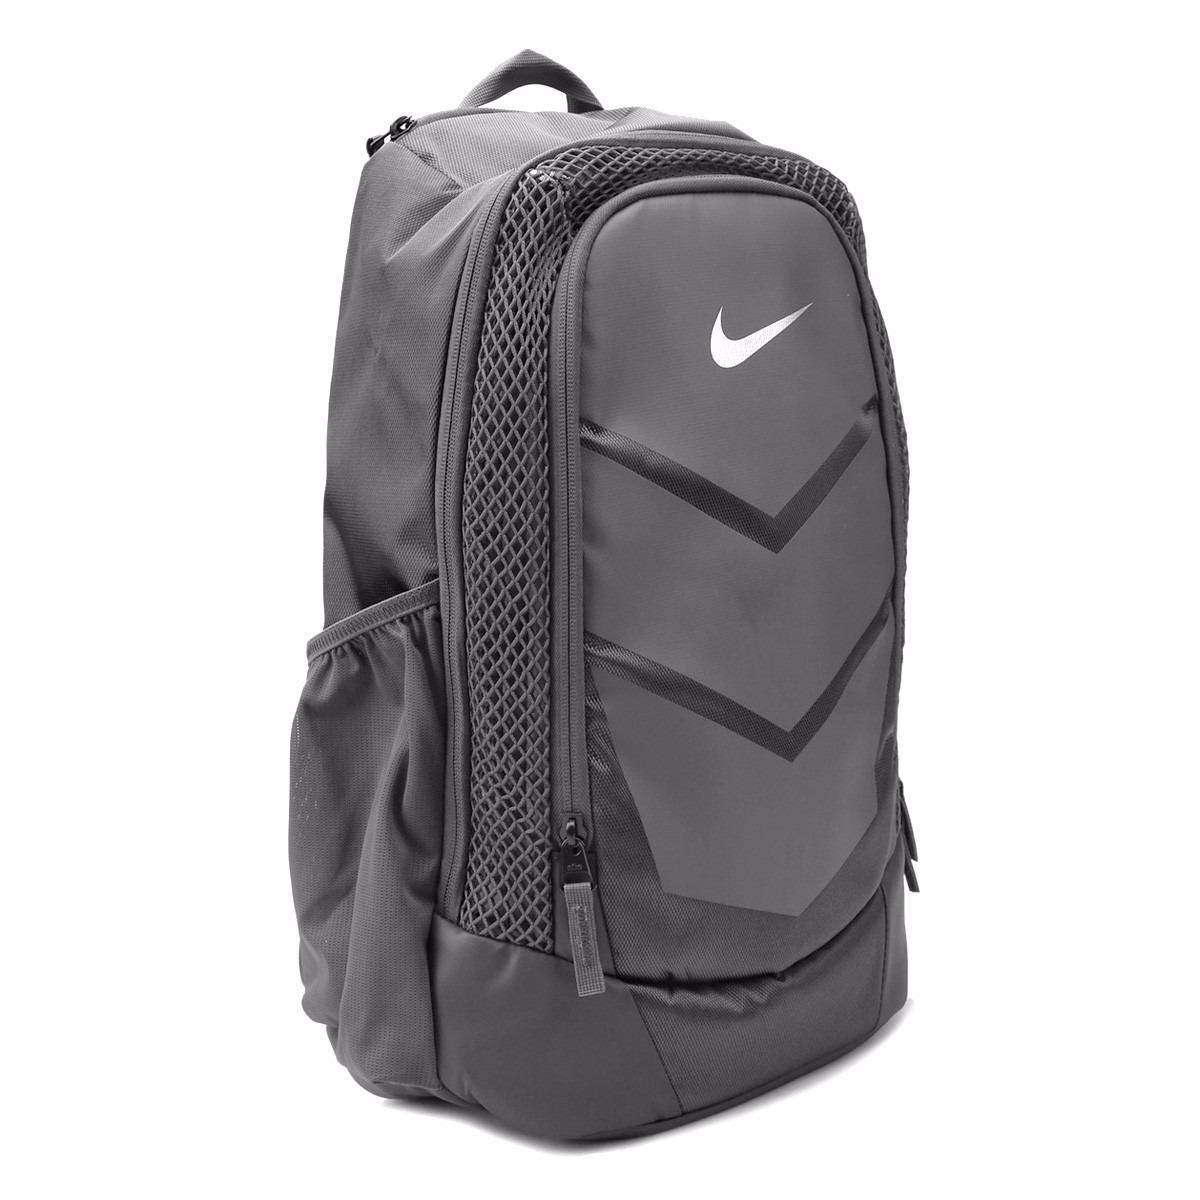 mochila nike vapor speed backpack masculina. Carregando zoom. ffbfd3589e7ba